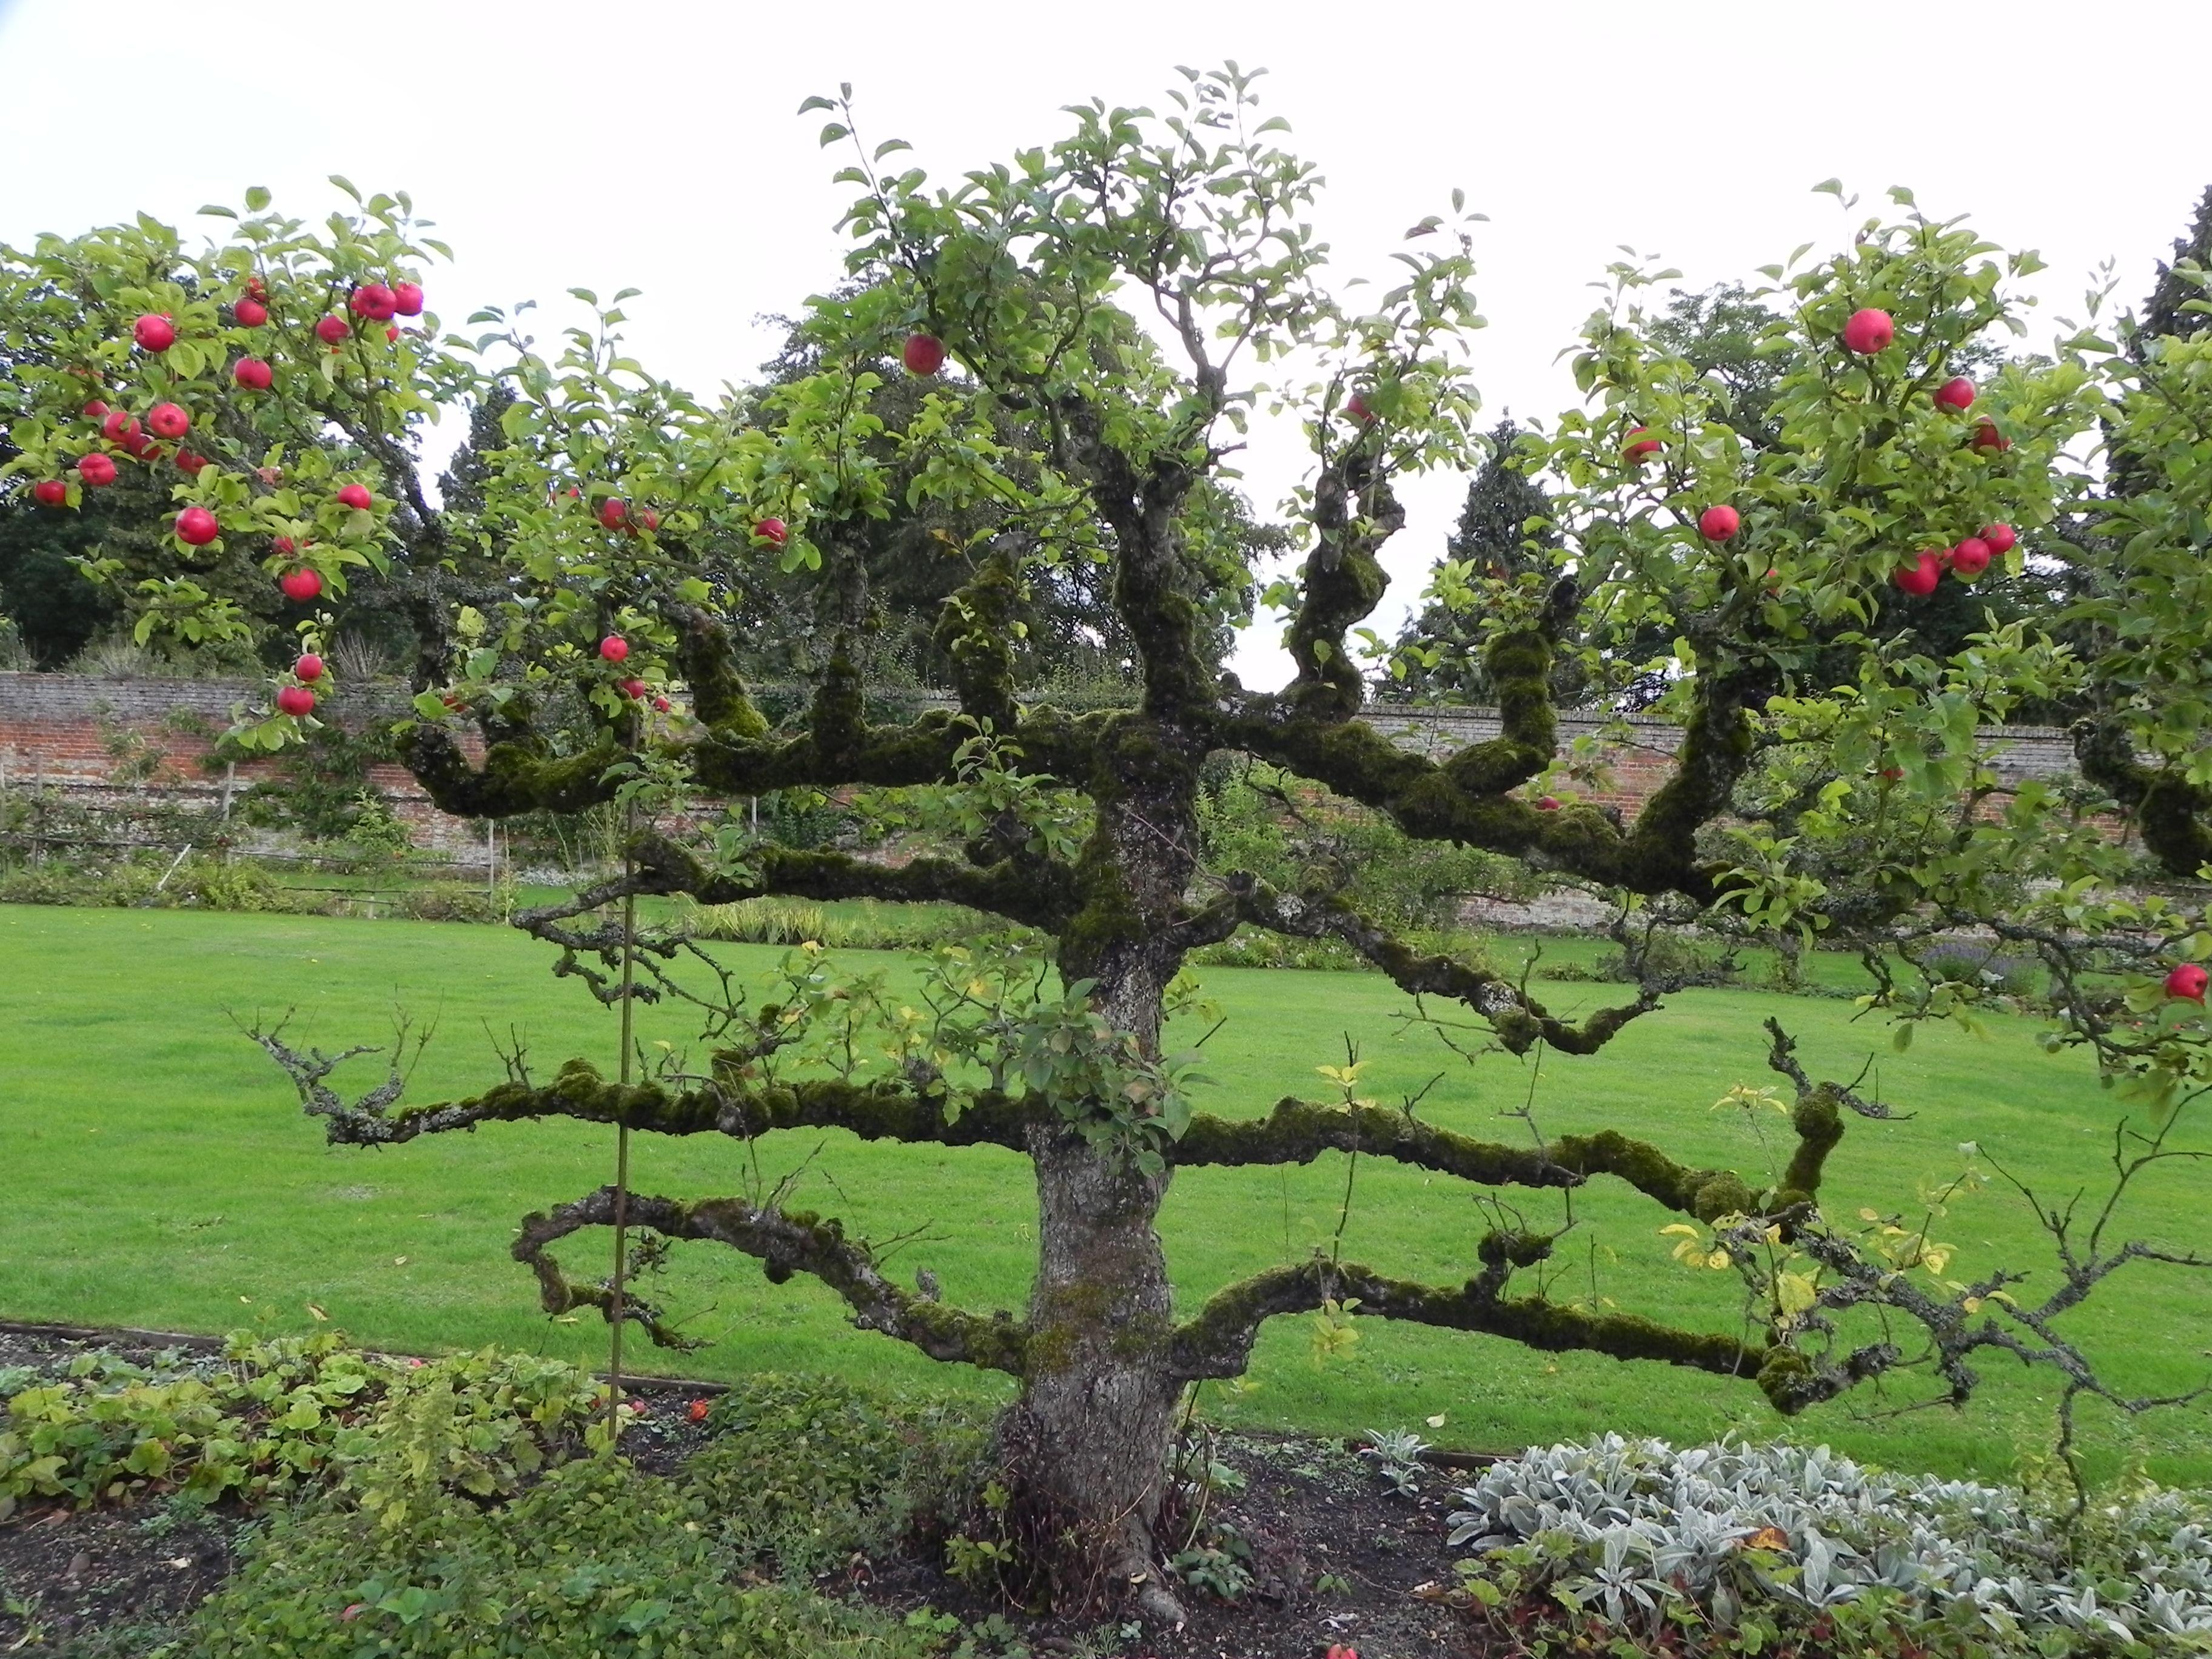 300 Year Old Apple Tree Tree Fruit Garden Fruit Trees Espalier Fruit Trees